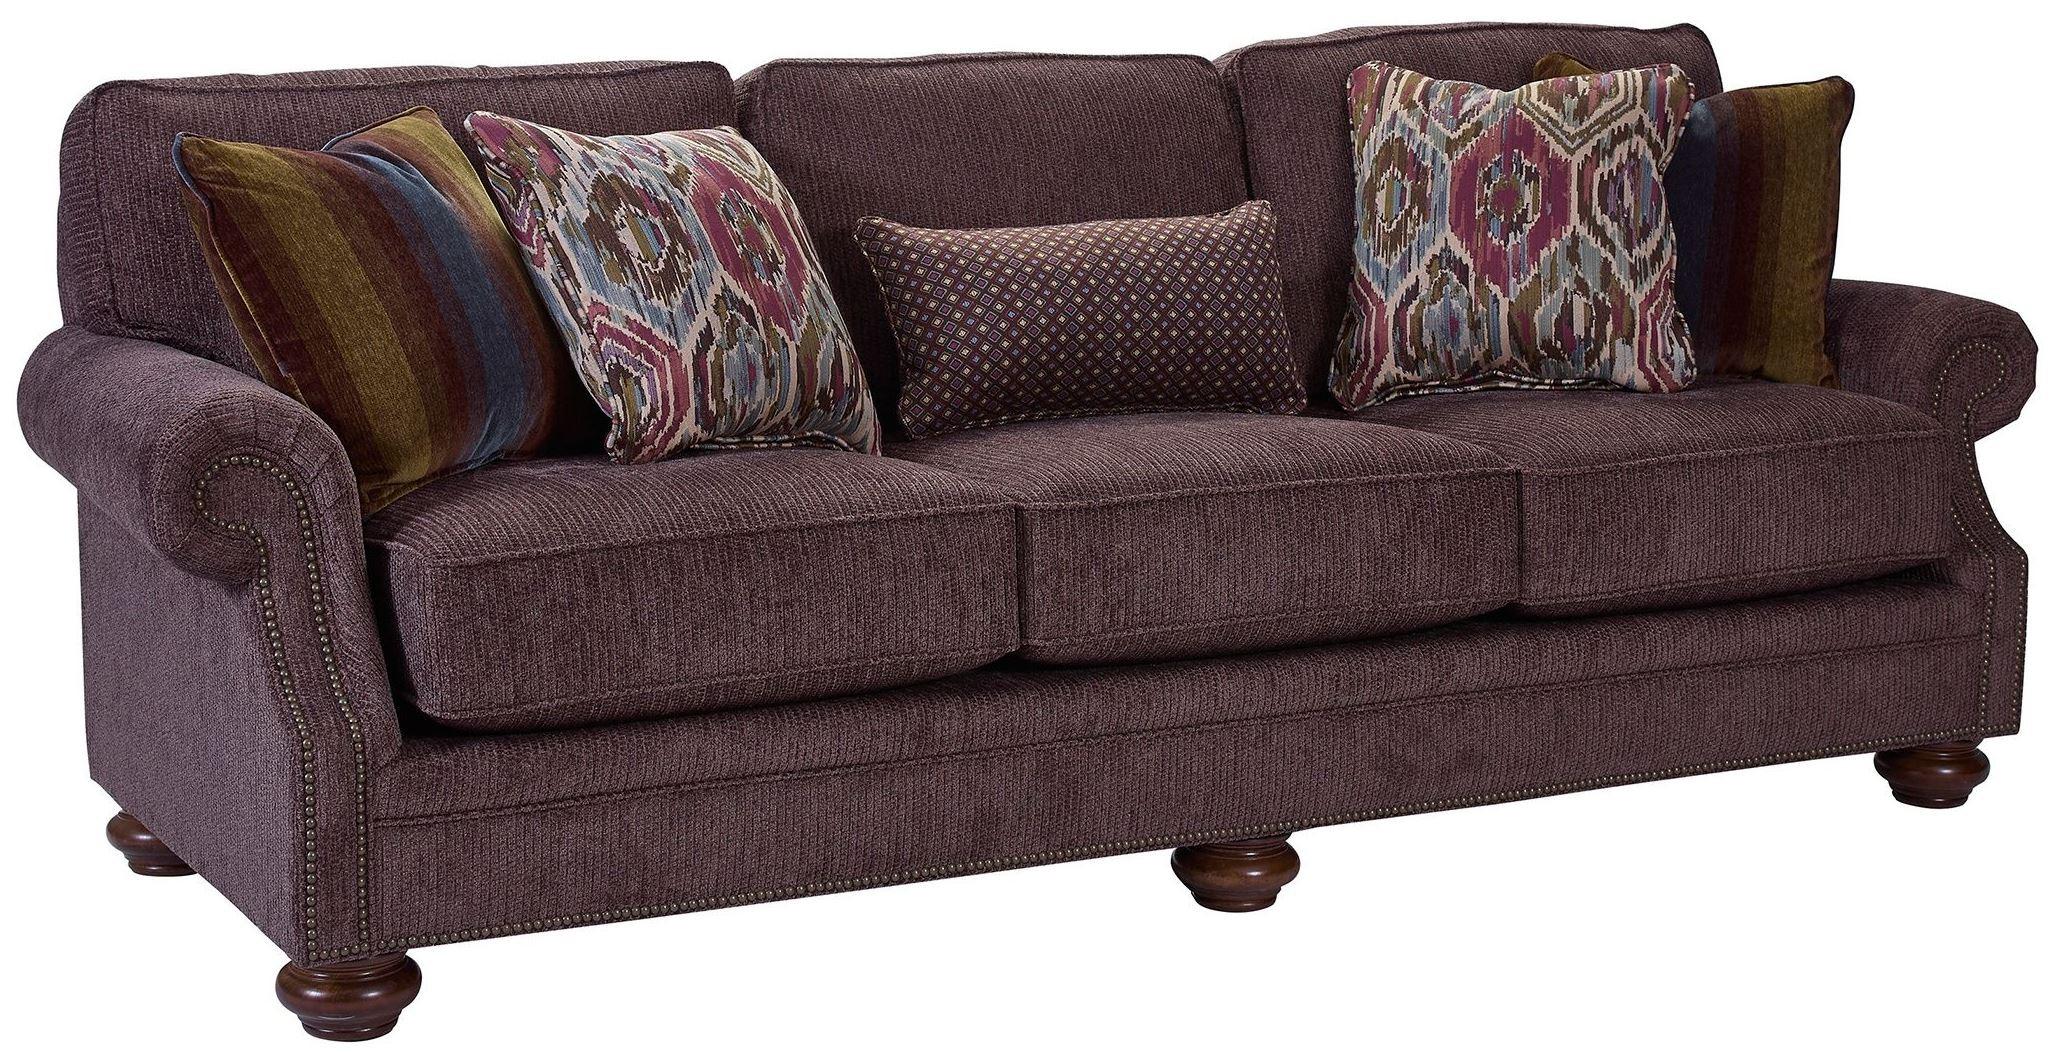 Heuer Walnut Chenille Fabric Sofa 4260 3q 4243 85 Broyhill